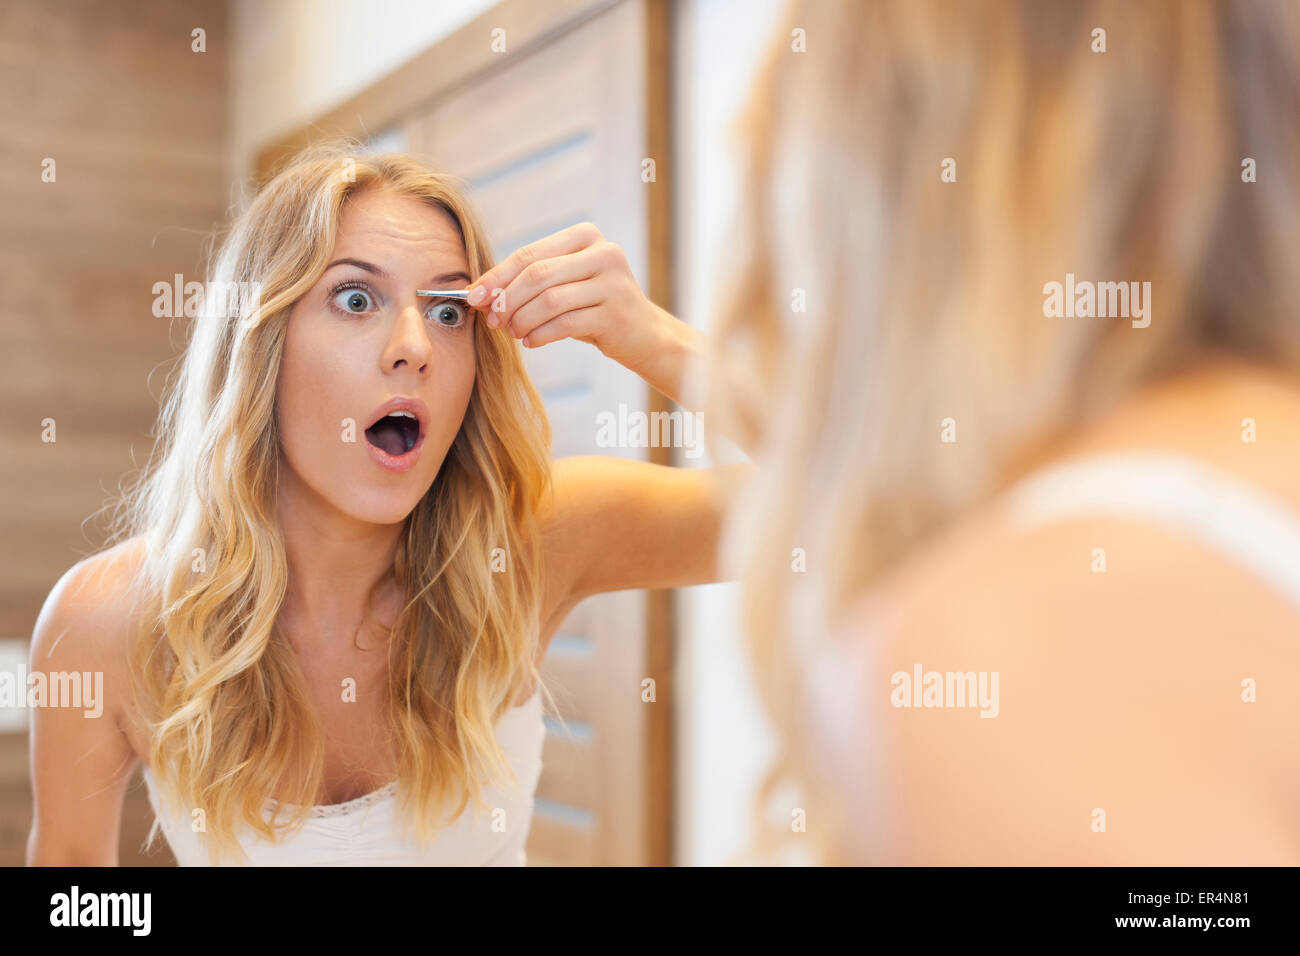 Angst, Frau tweezing Augenbrauen im Badezimmer. Debica, Polen Stockbild